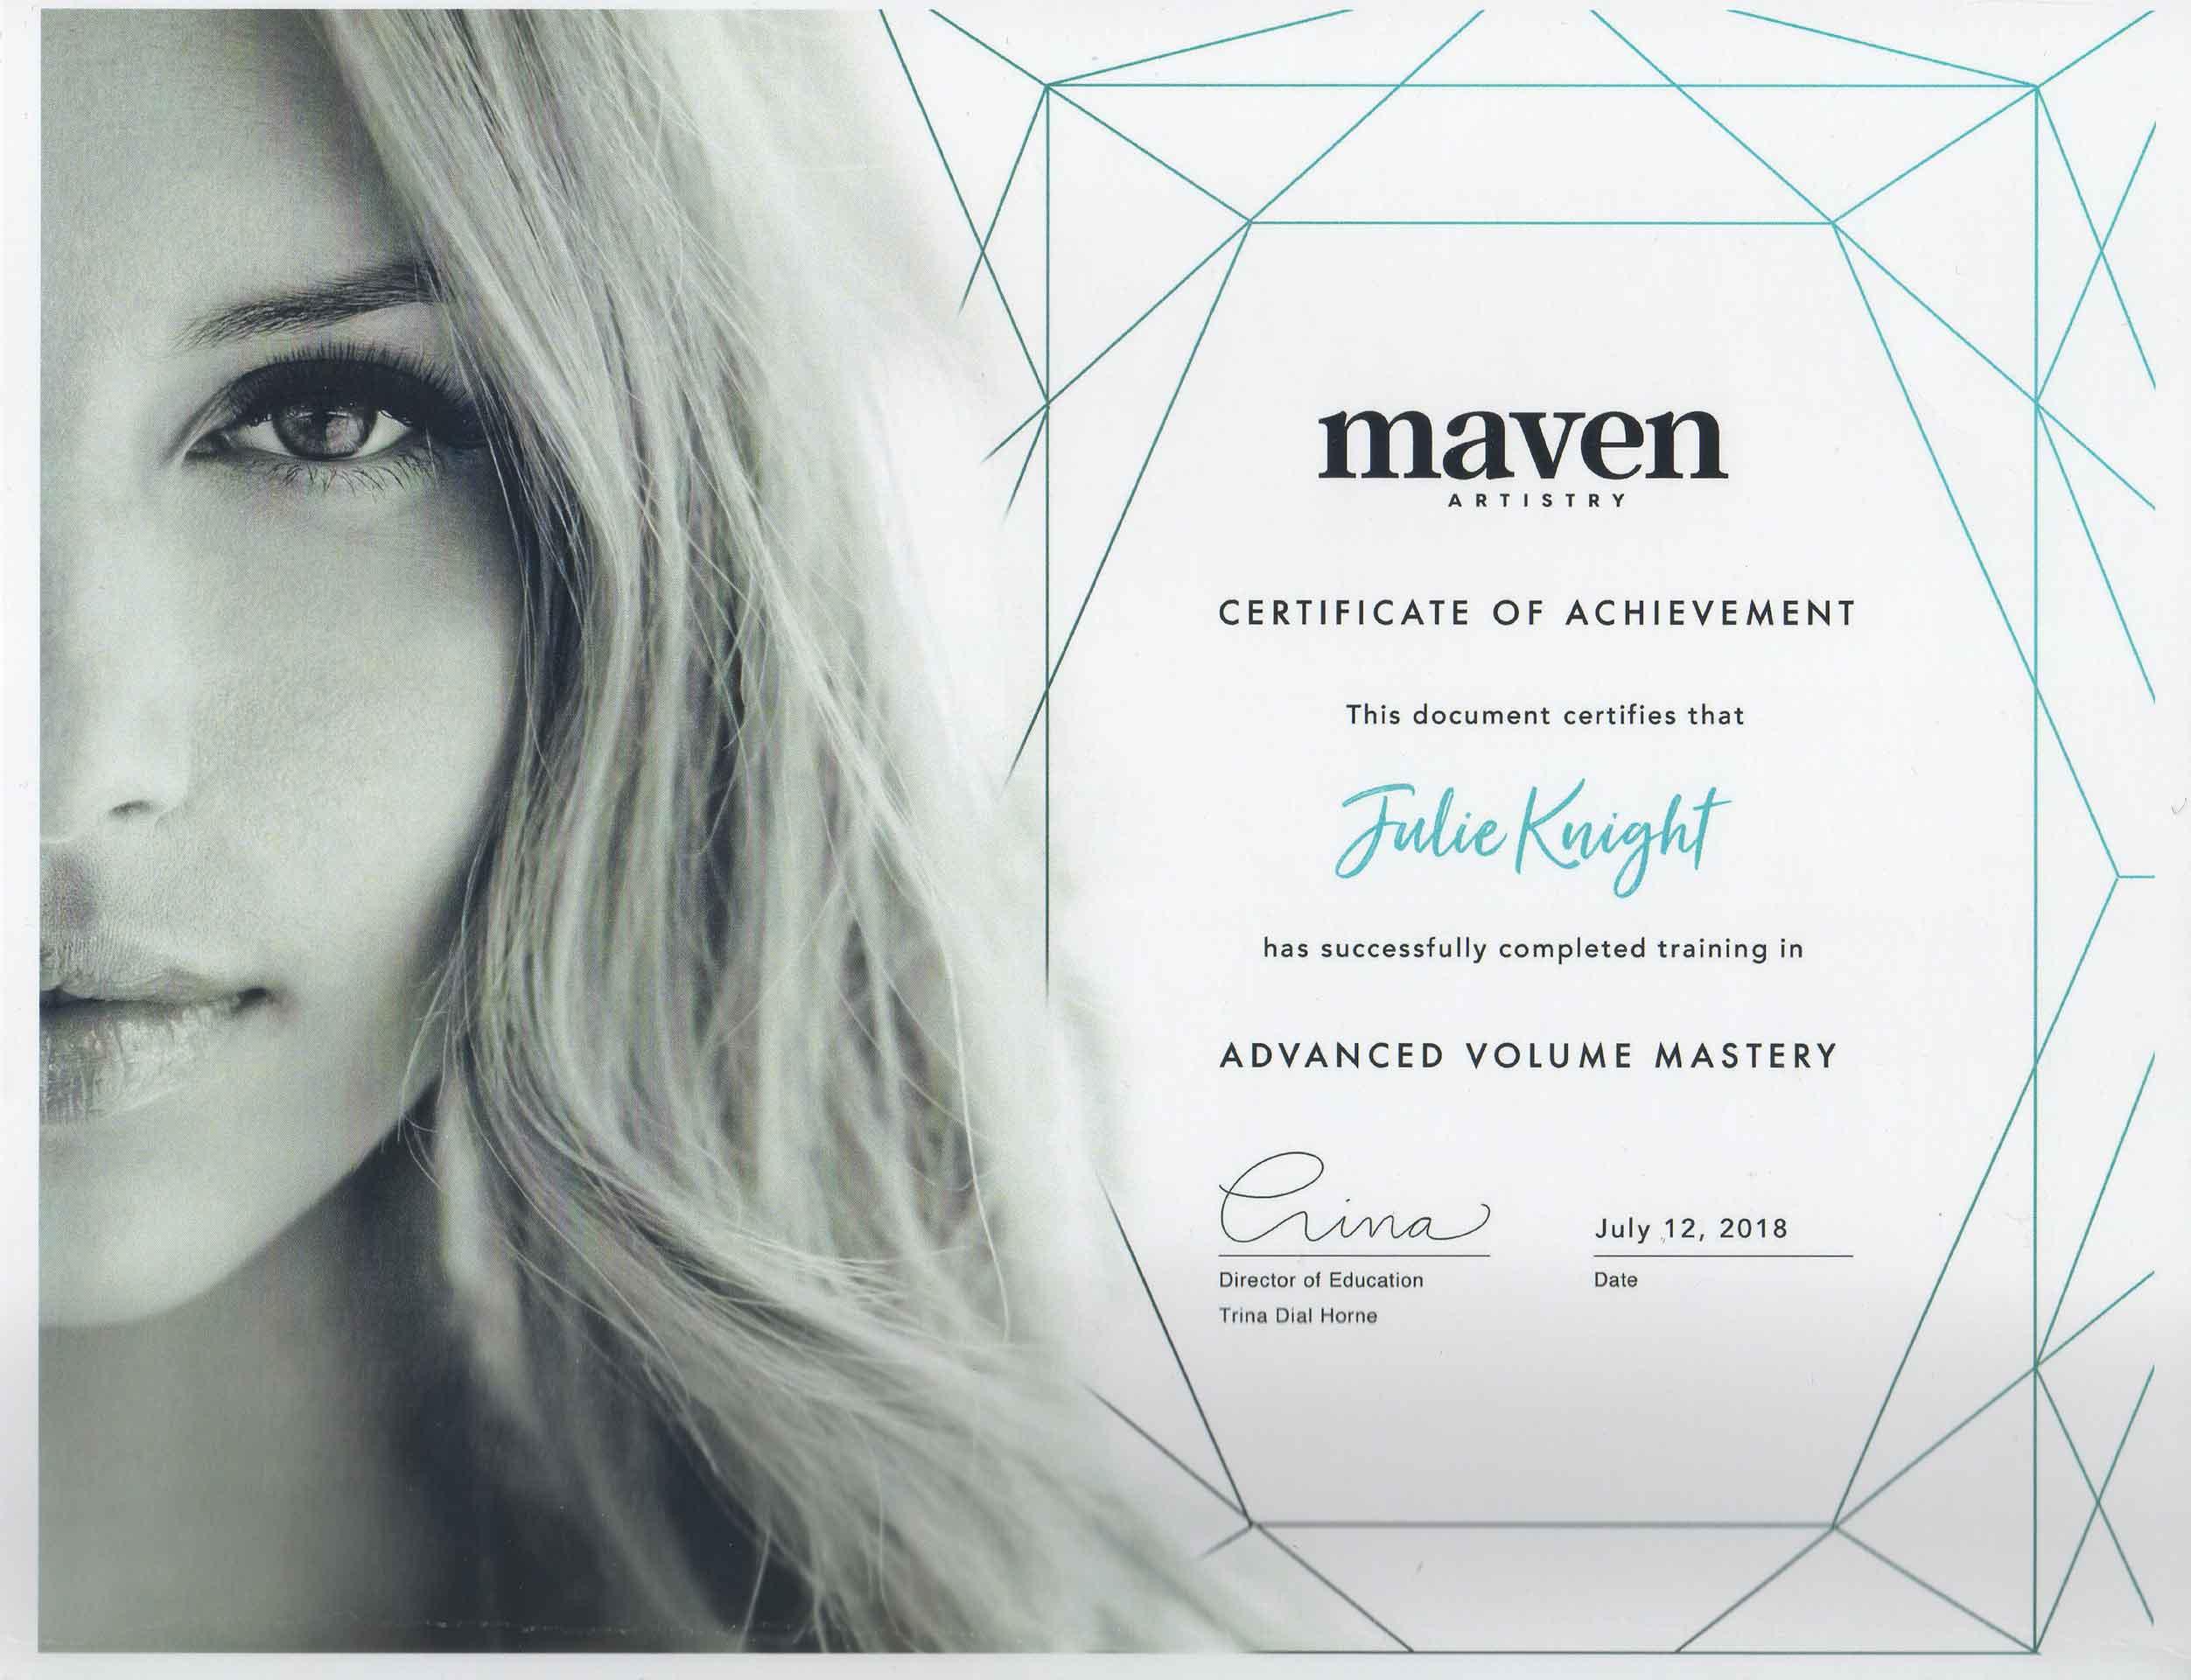 Julie-Knight-Maven-Artistry-Advanced-Volume-Artistry-Certificate